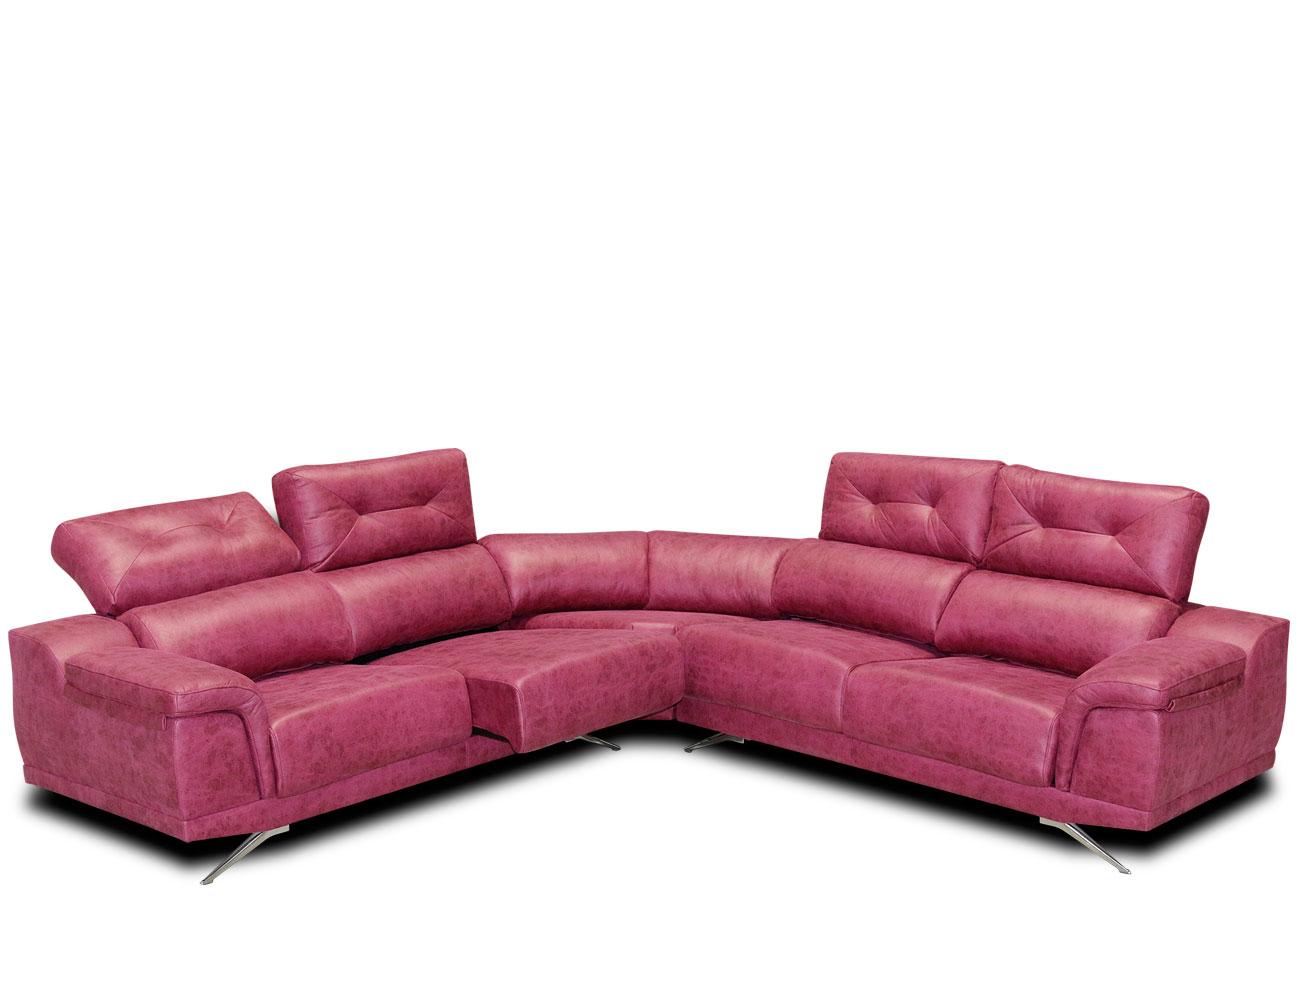 Sofa rinconera tejido antimanchas fucsia rosa